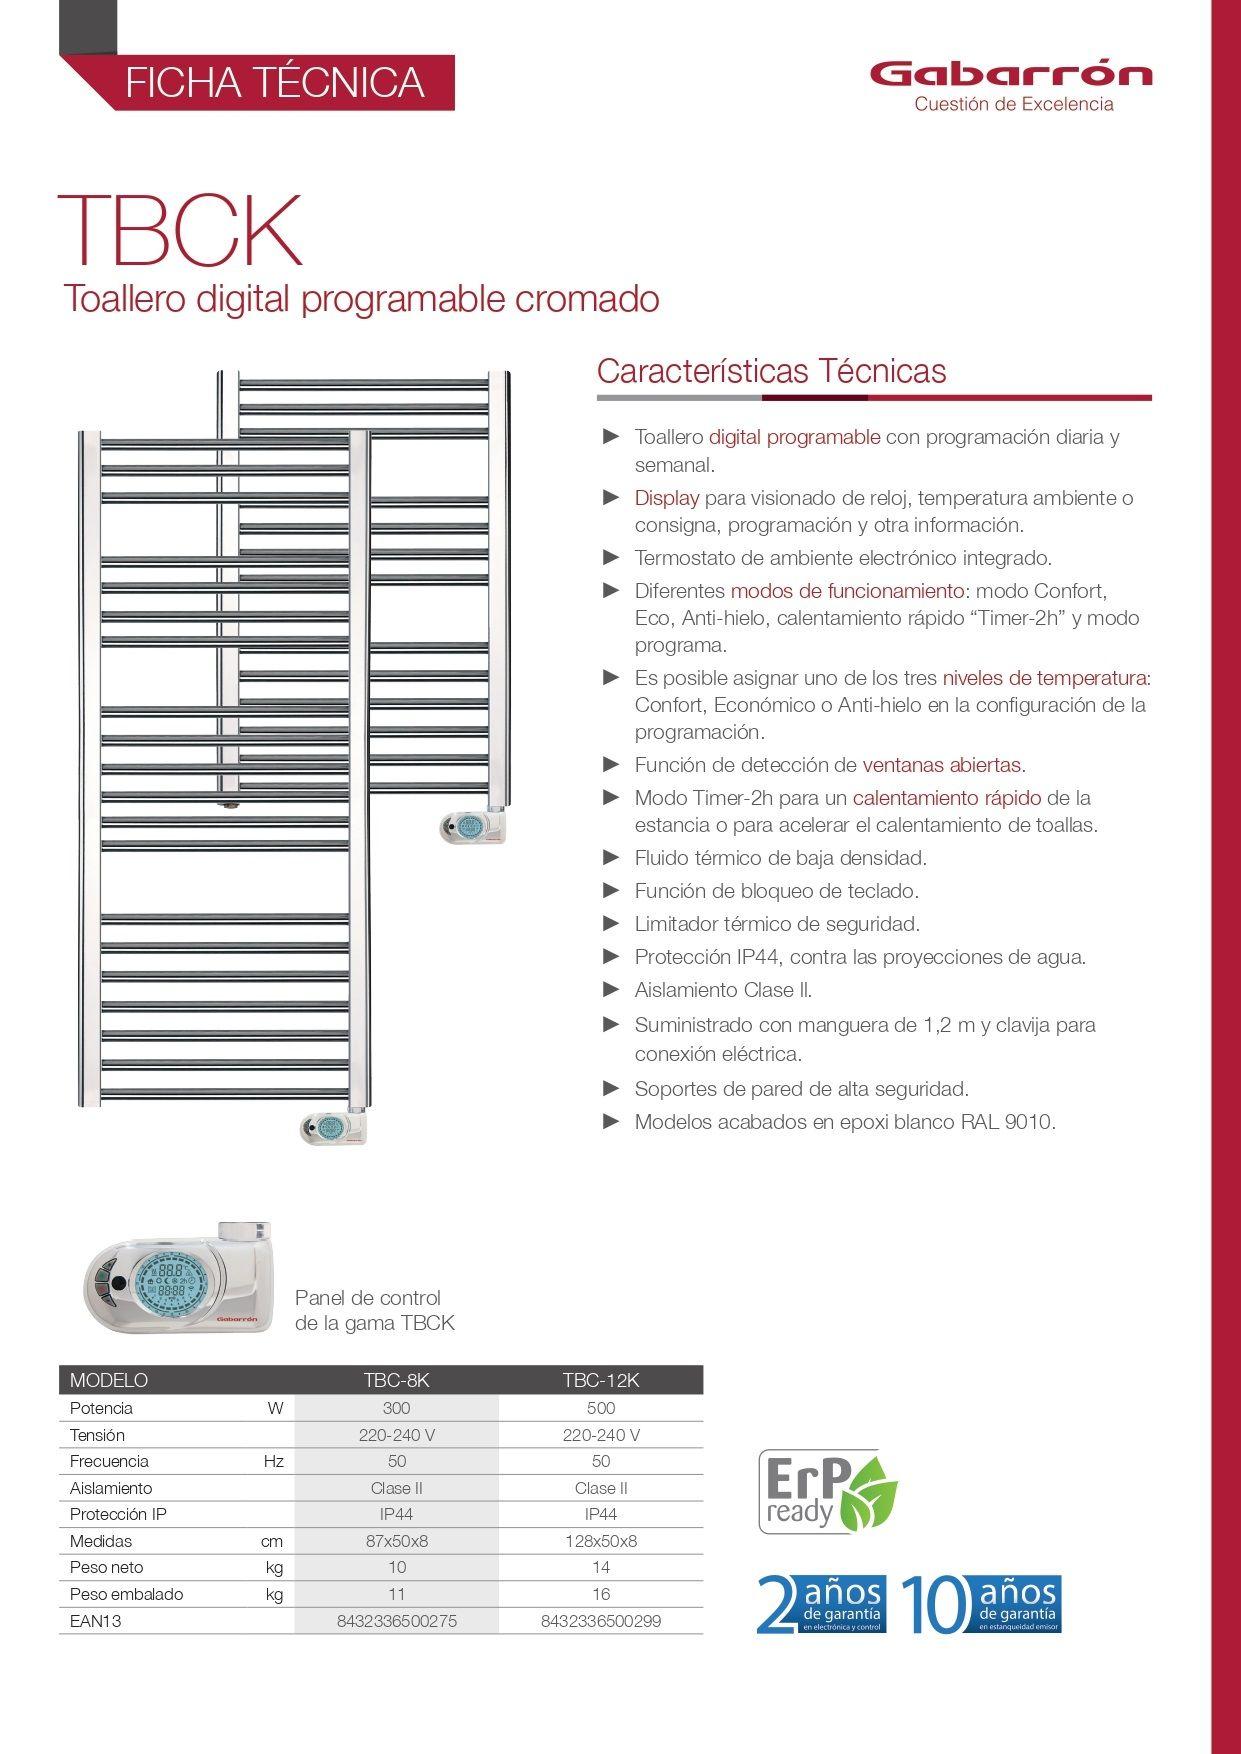 Ficha técnica toallero Gabarron TBCK